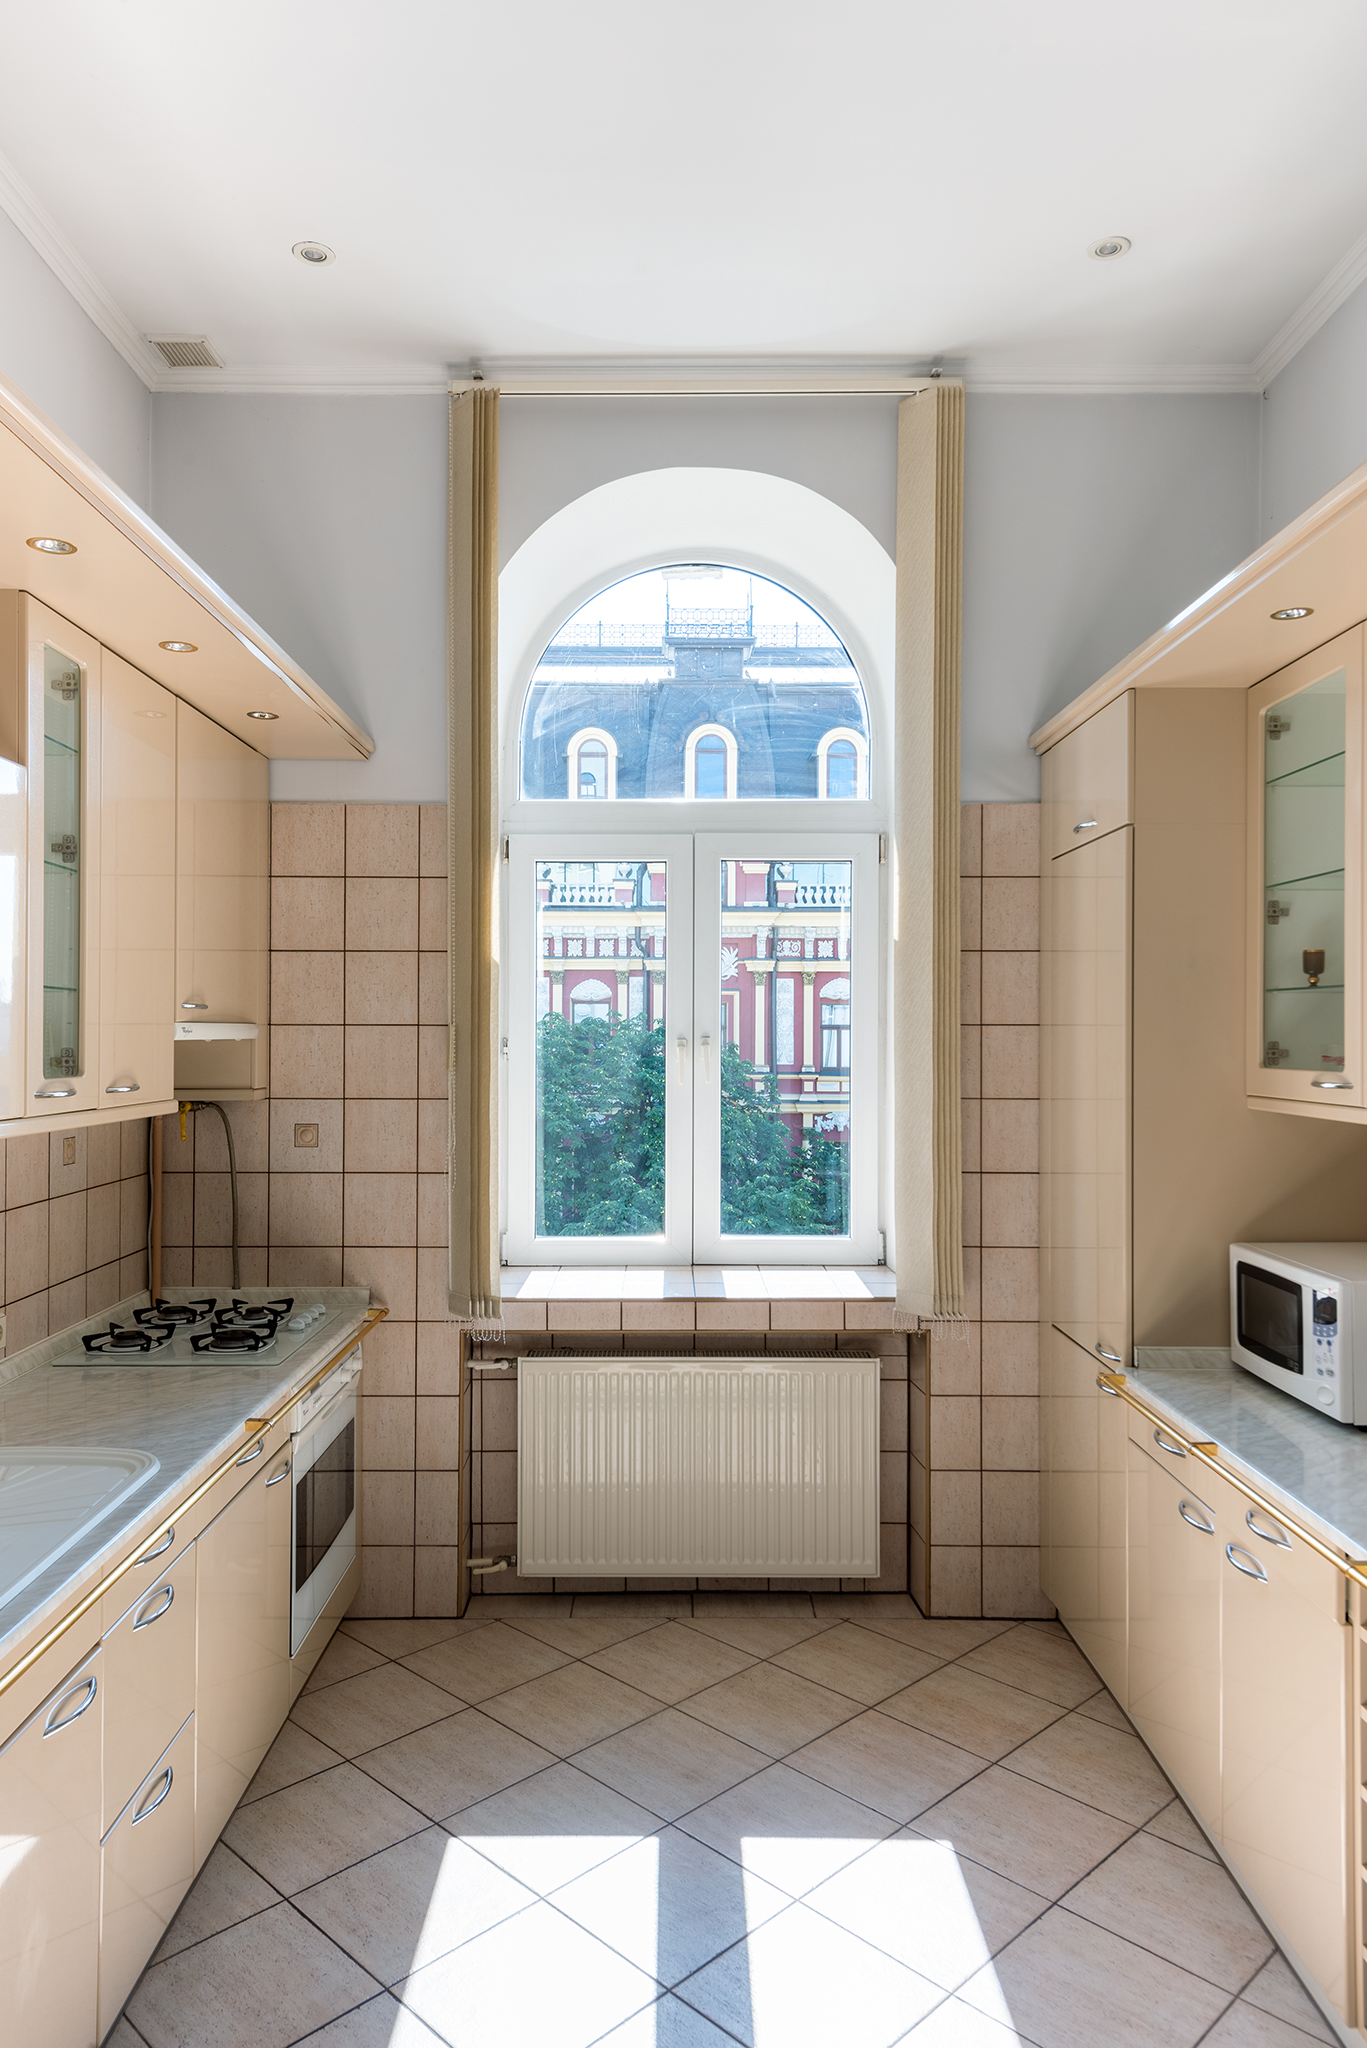 Investissement Immobilier Kiev, Ukraine - Cuisine